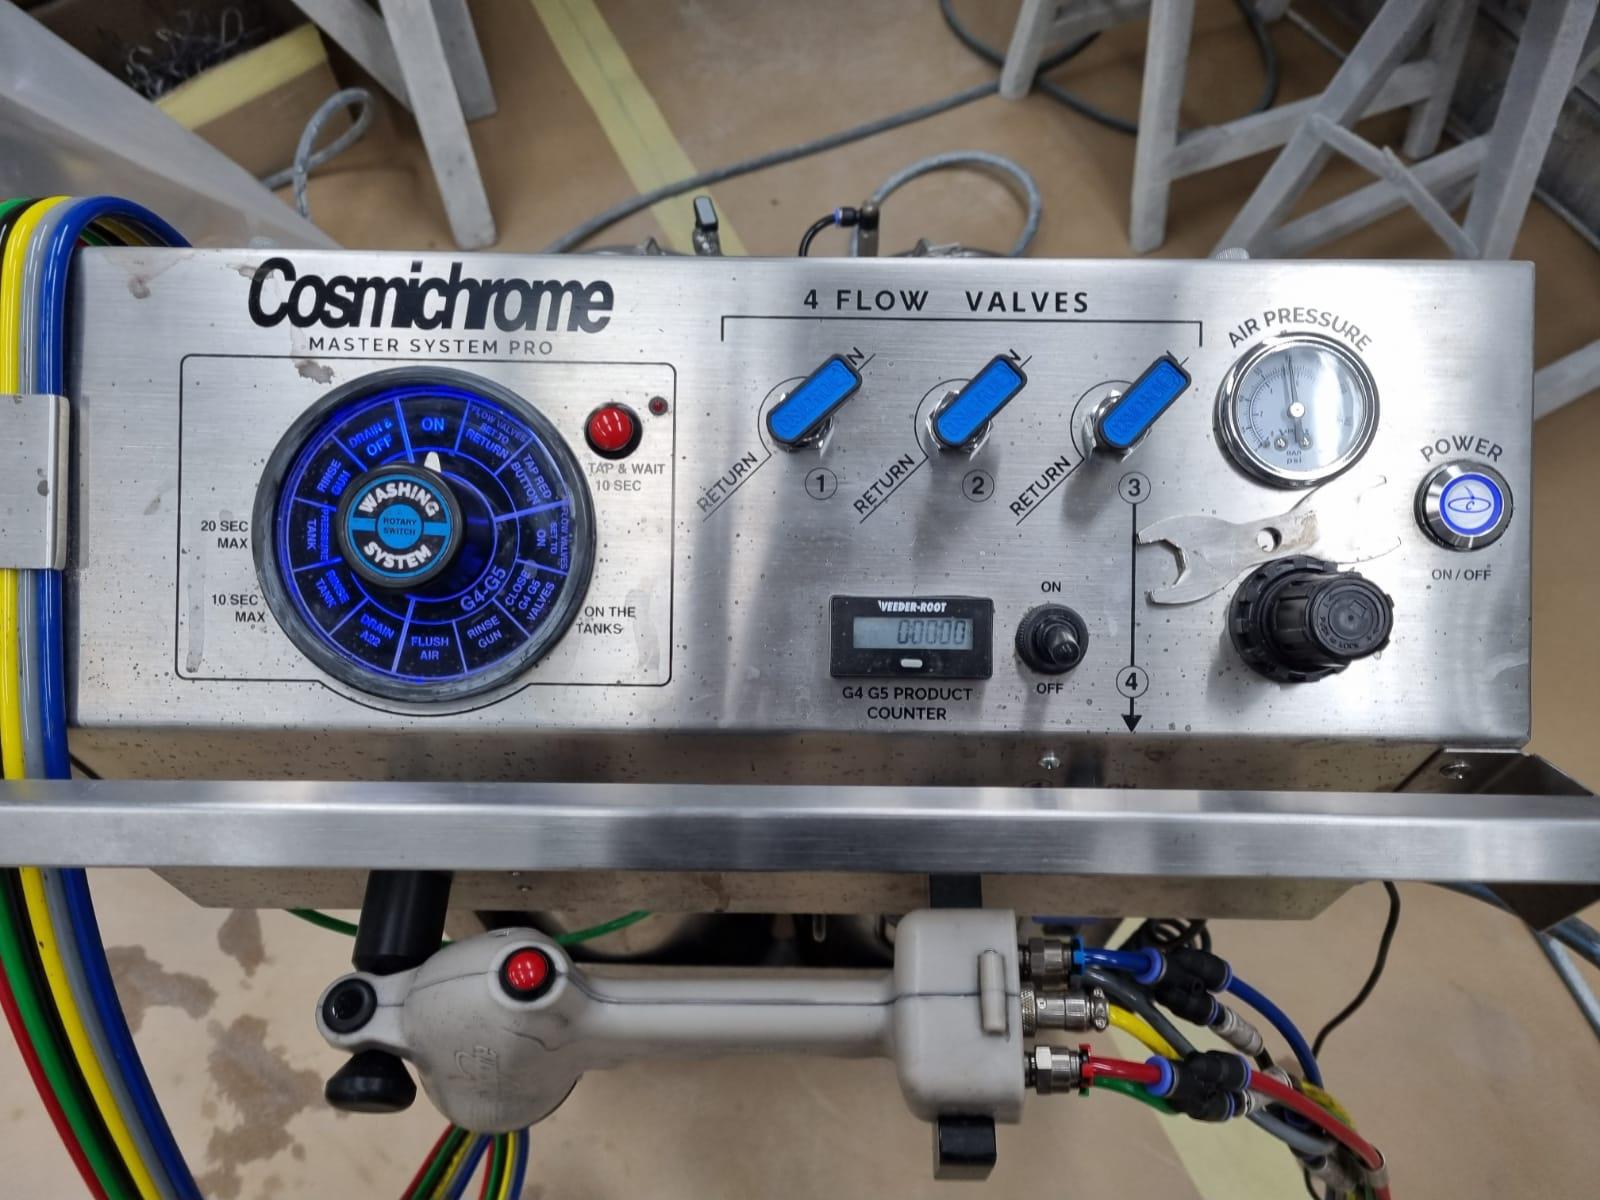 Master System Pro - 5 - Cosmichrome© - Atlantik Chrome